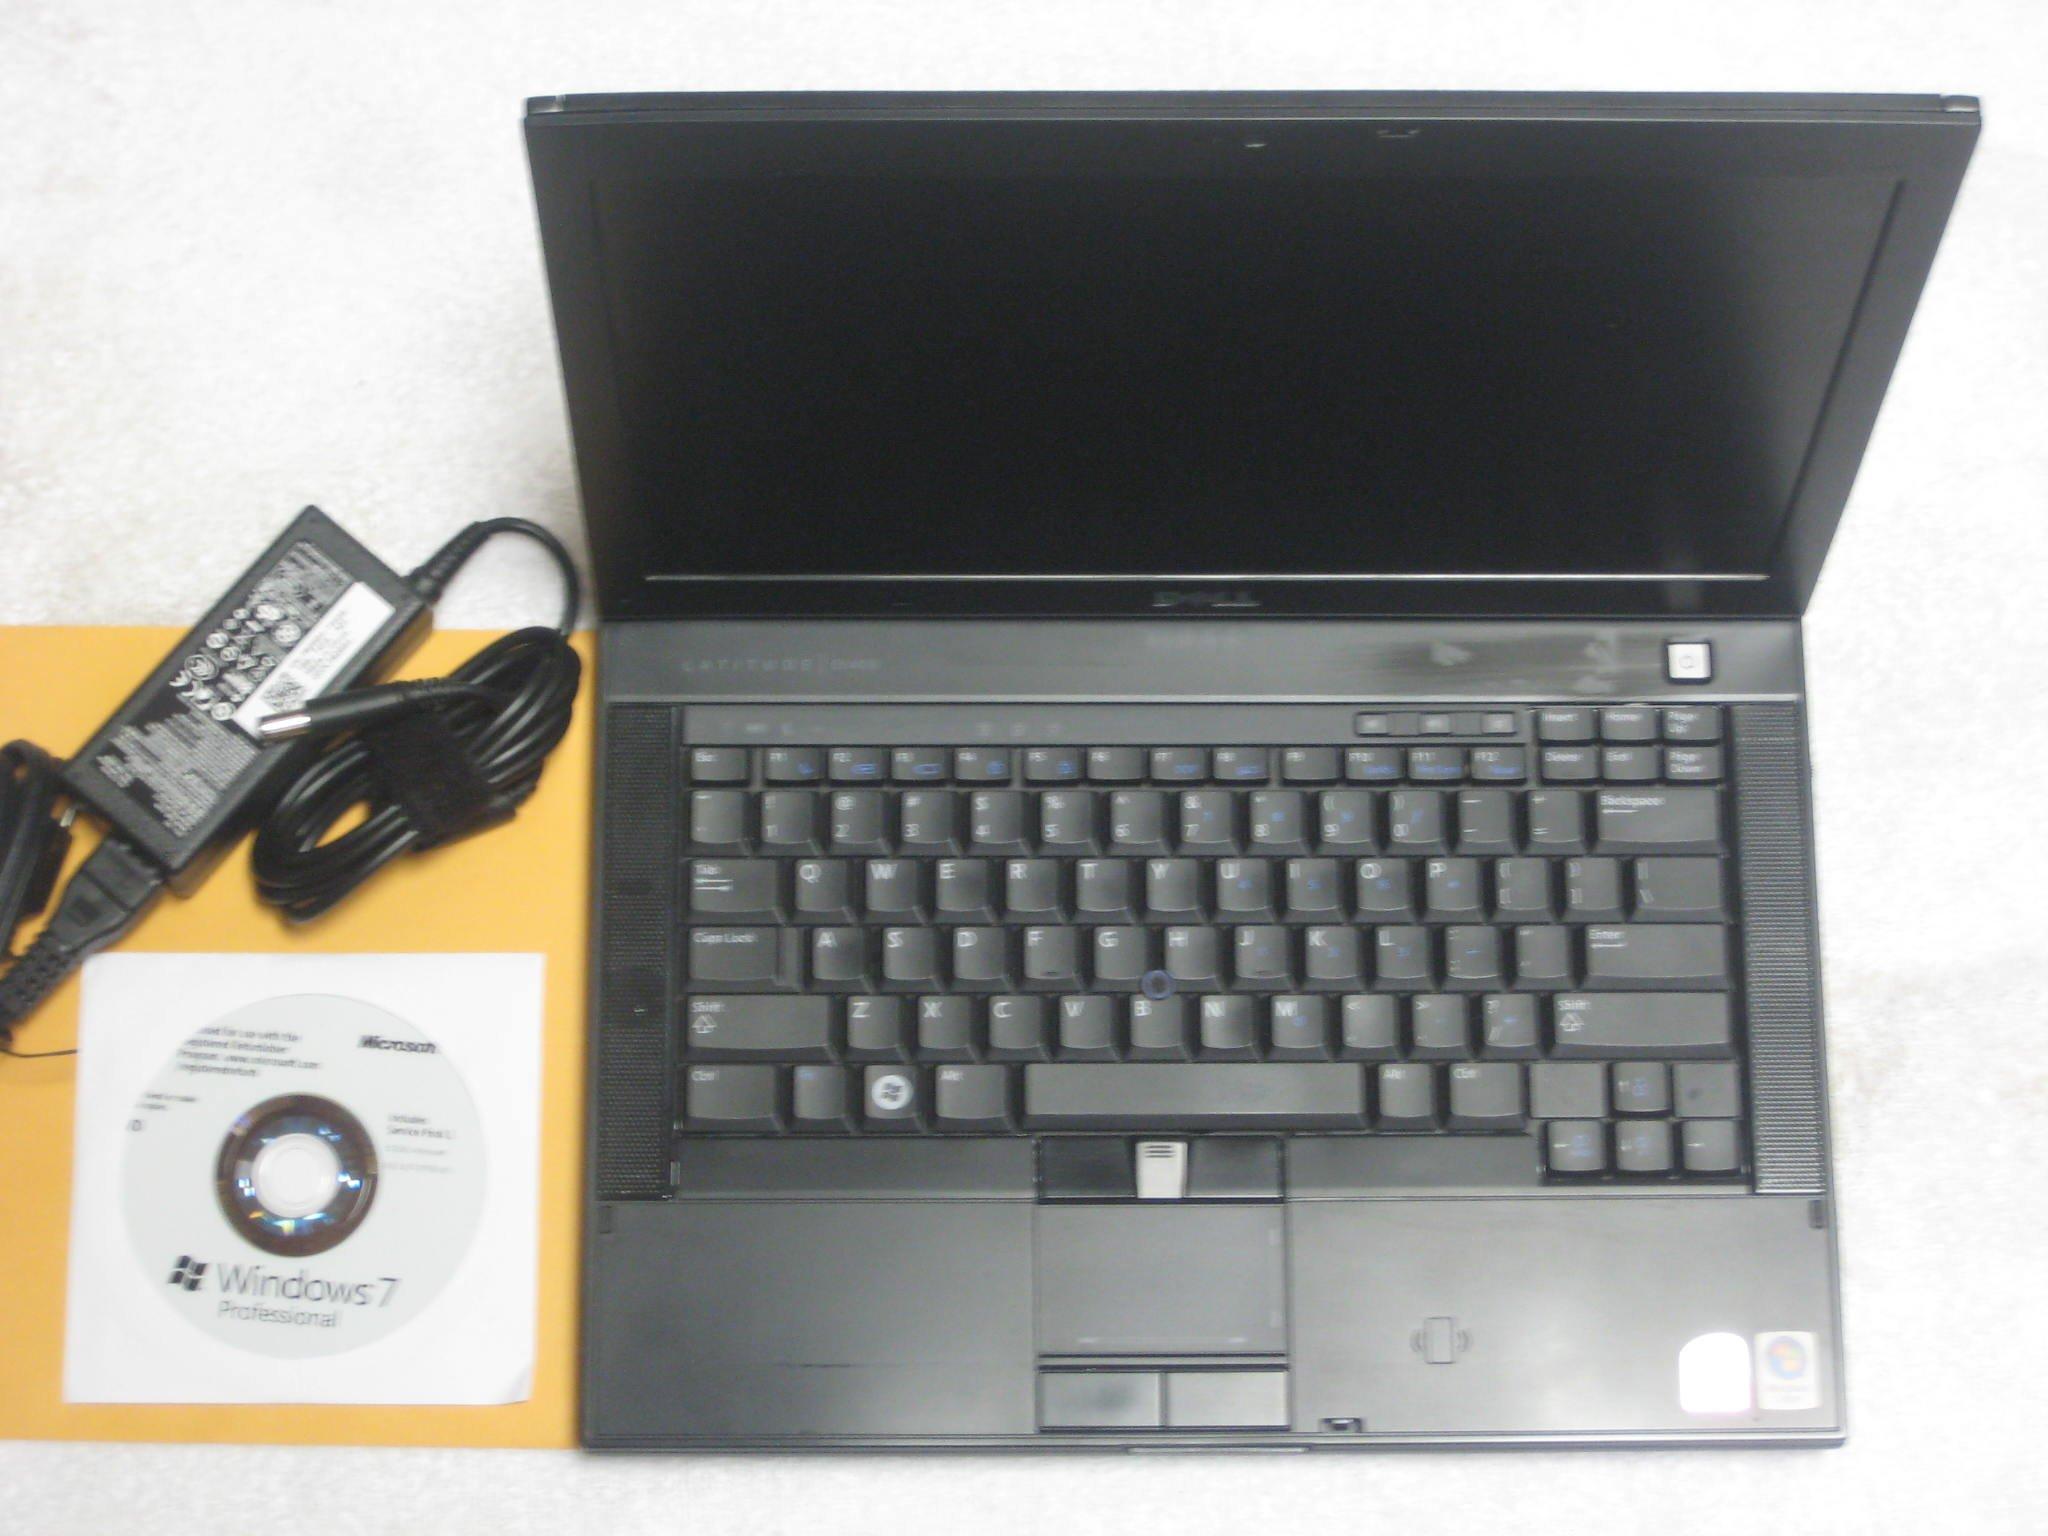 Buy Dell Latitude E6400 Laptop Computer Intel Core2 Duo 4gb Windows 7 Home Premium 1 Year Warranty At Best Price In Canada Discountkart Ca